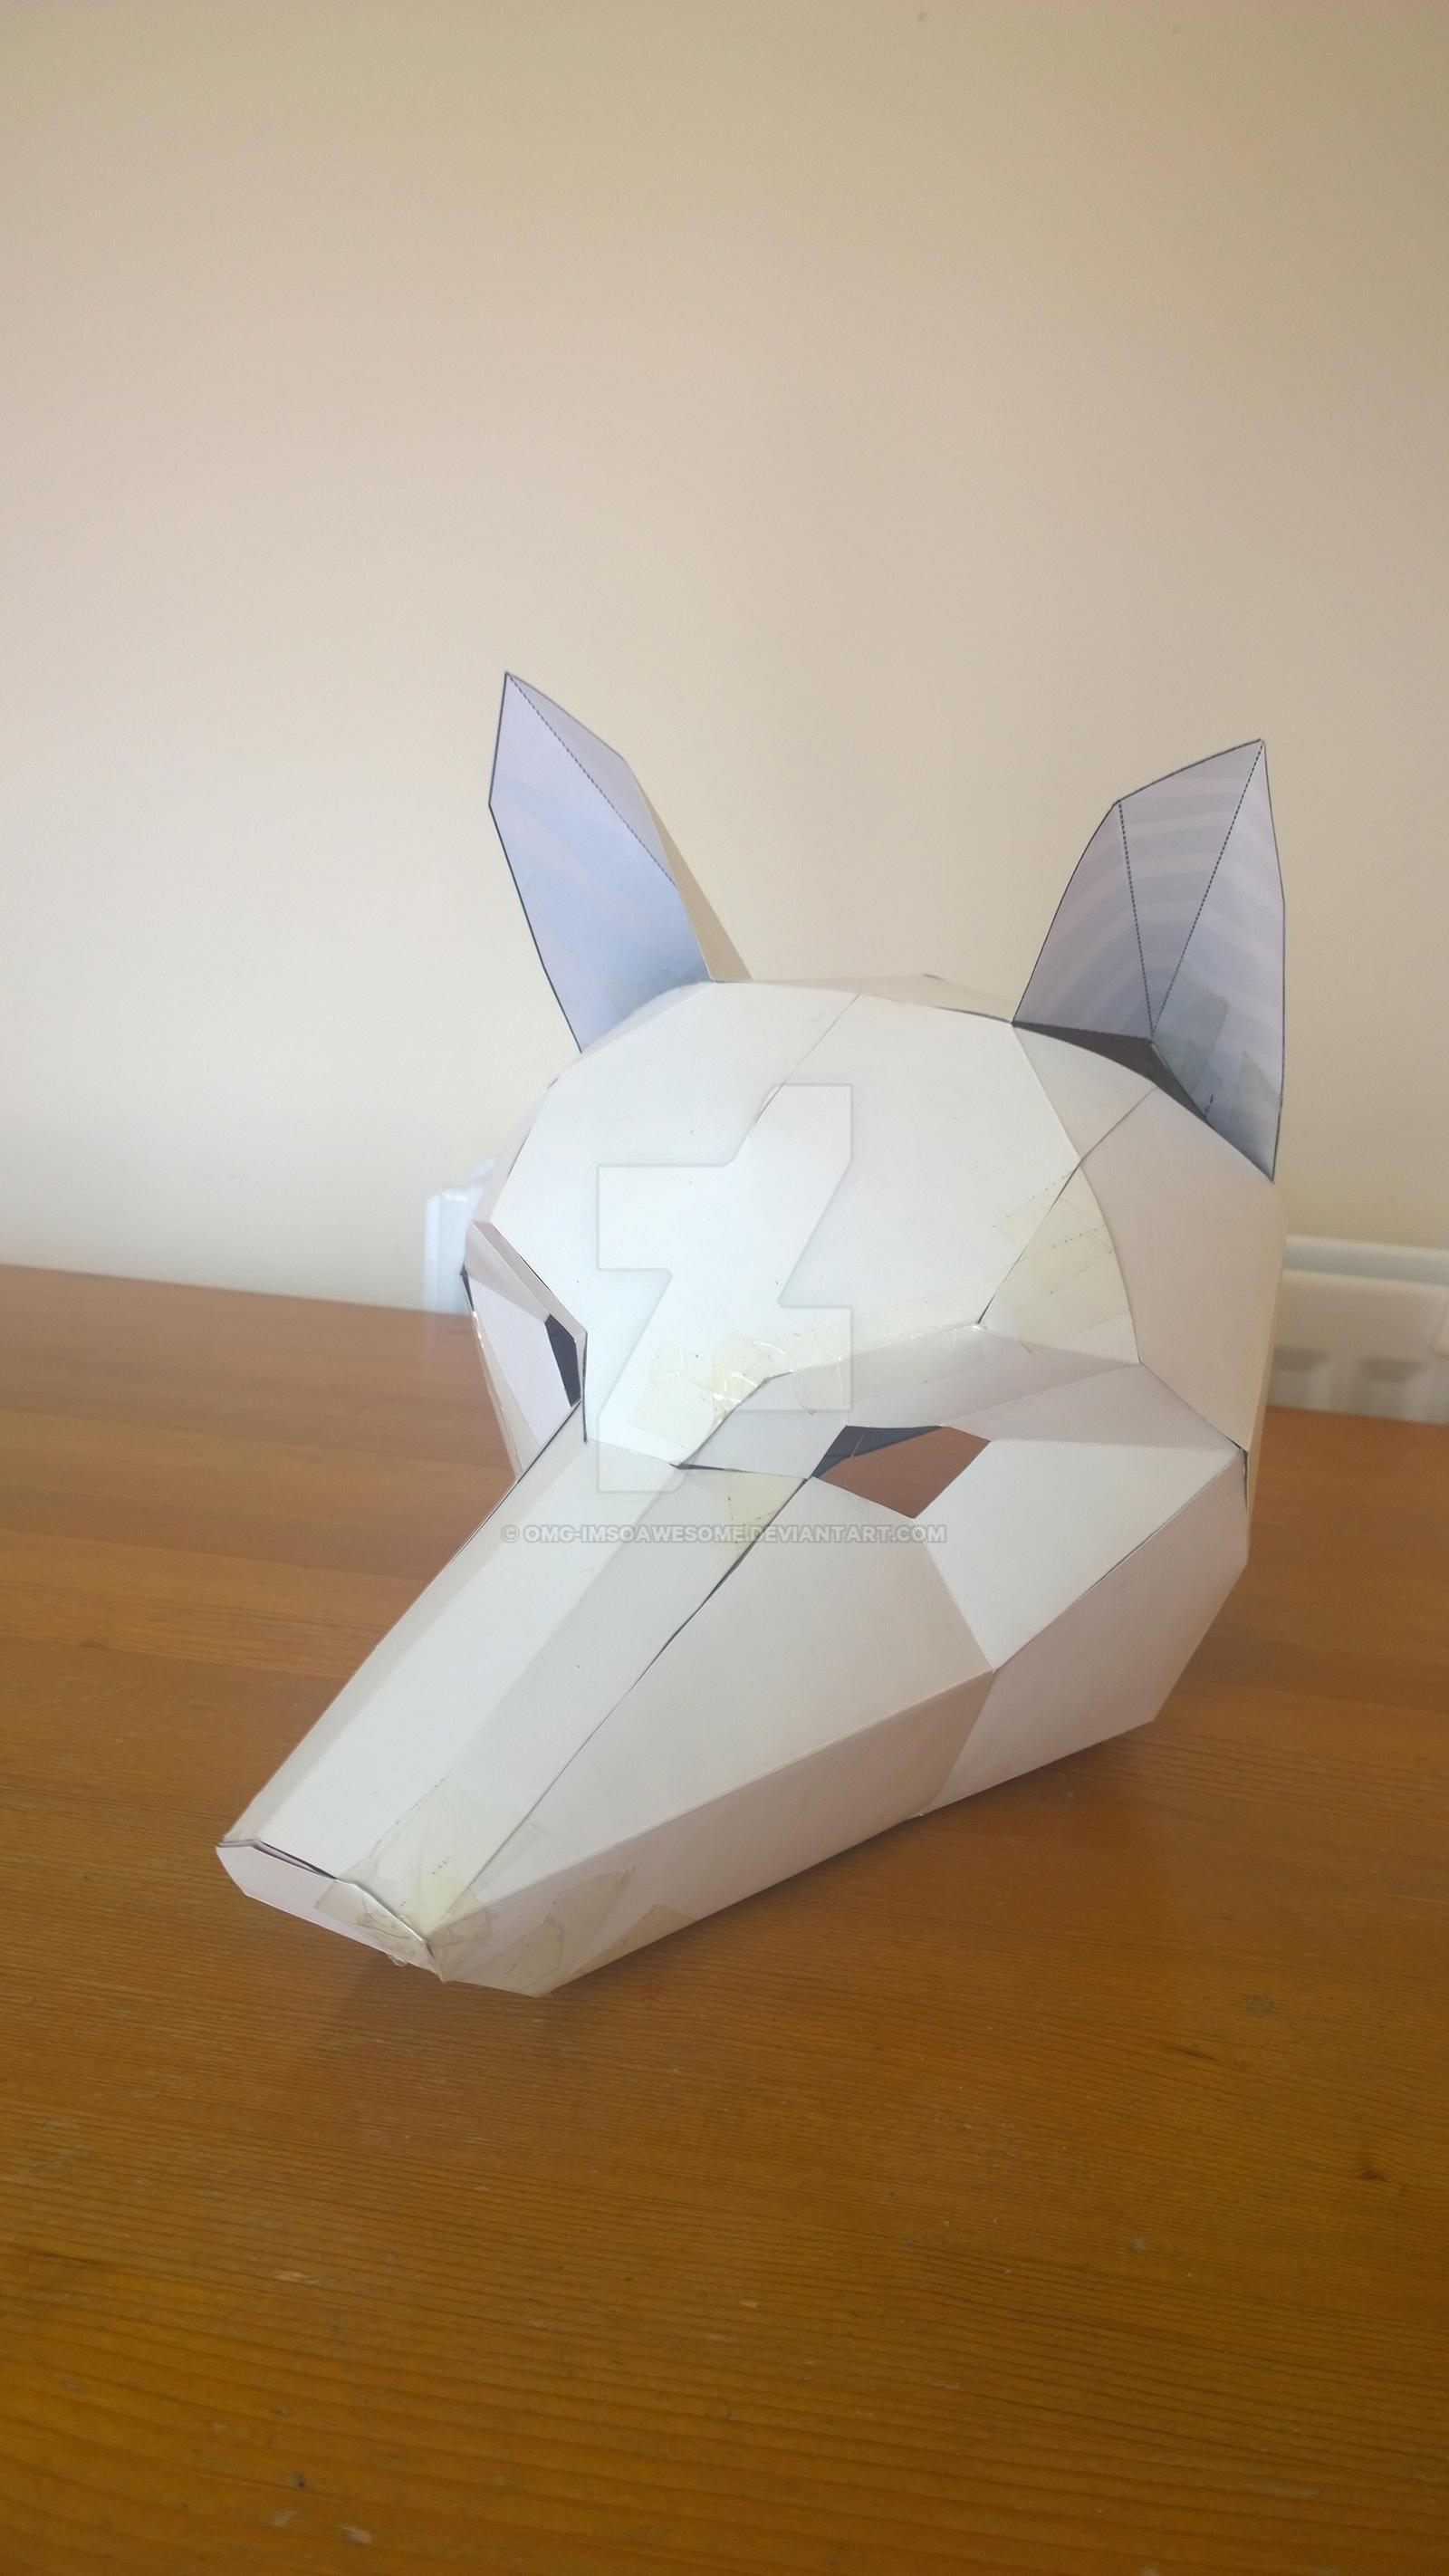 Wintercroft Fox Mask Book + Free Digital Mask  Wintercroft Fox Mask